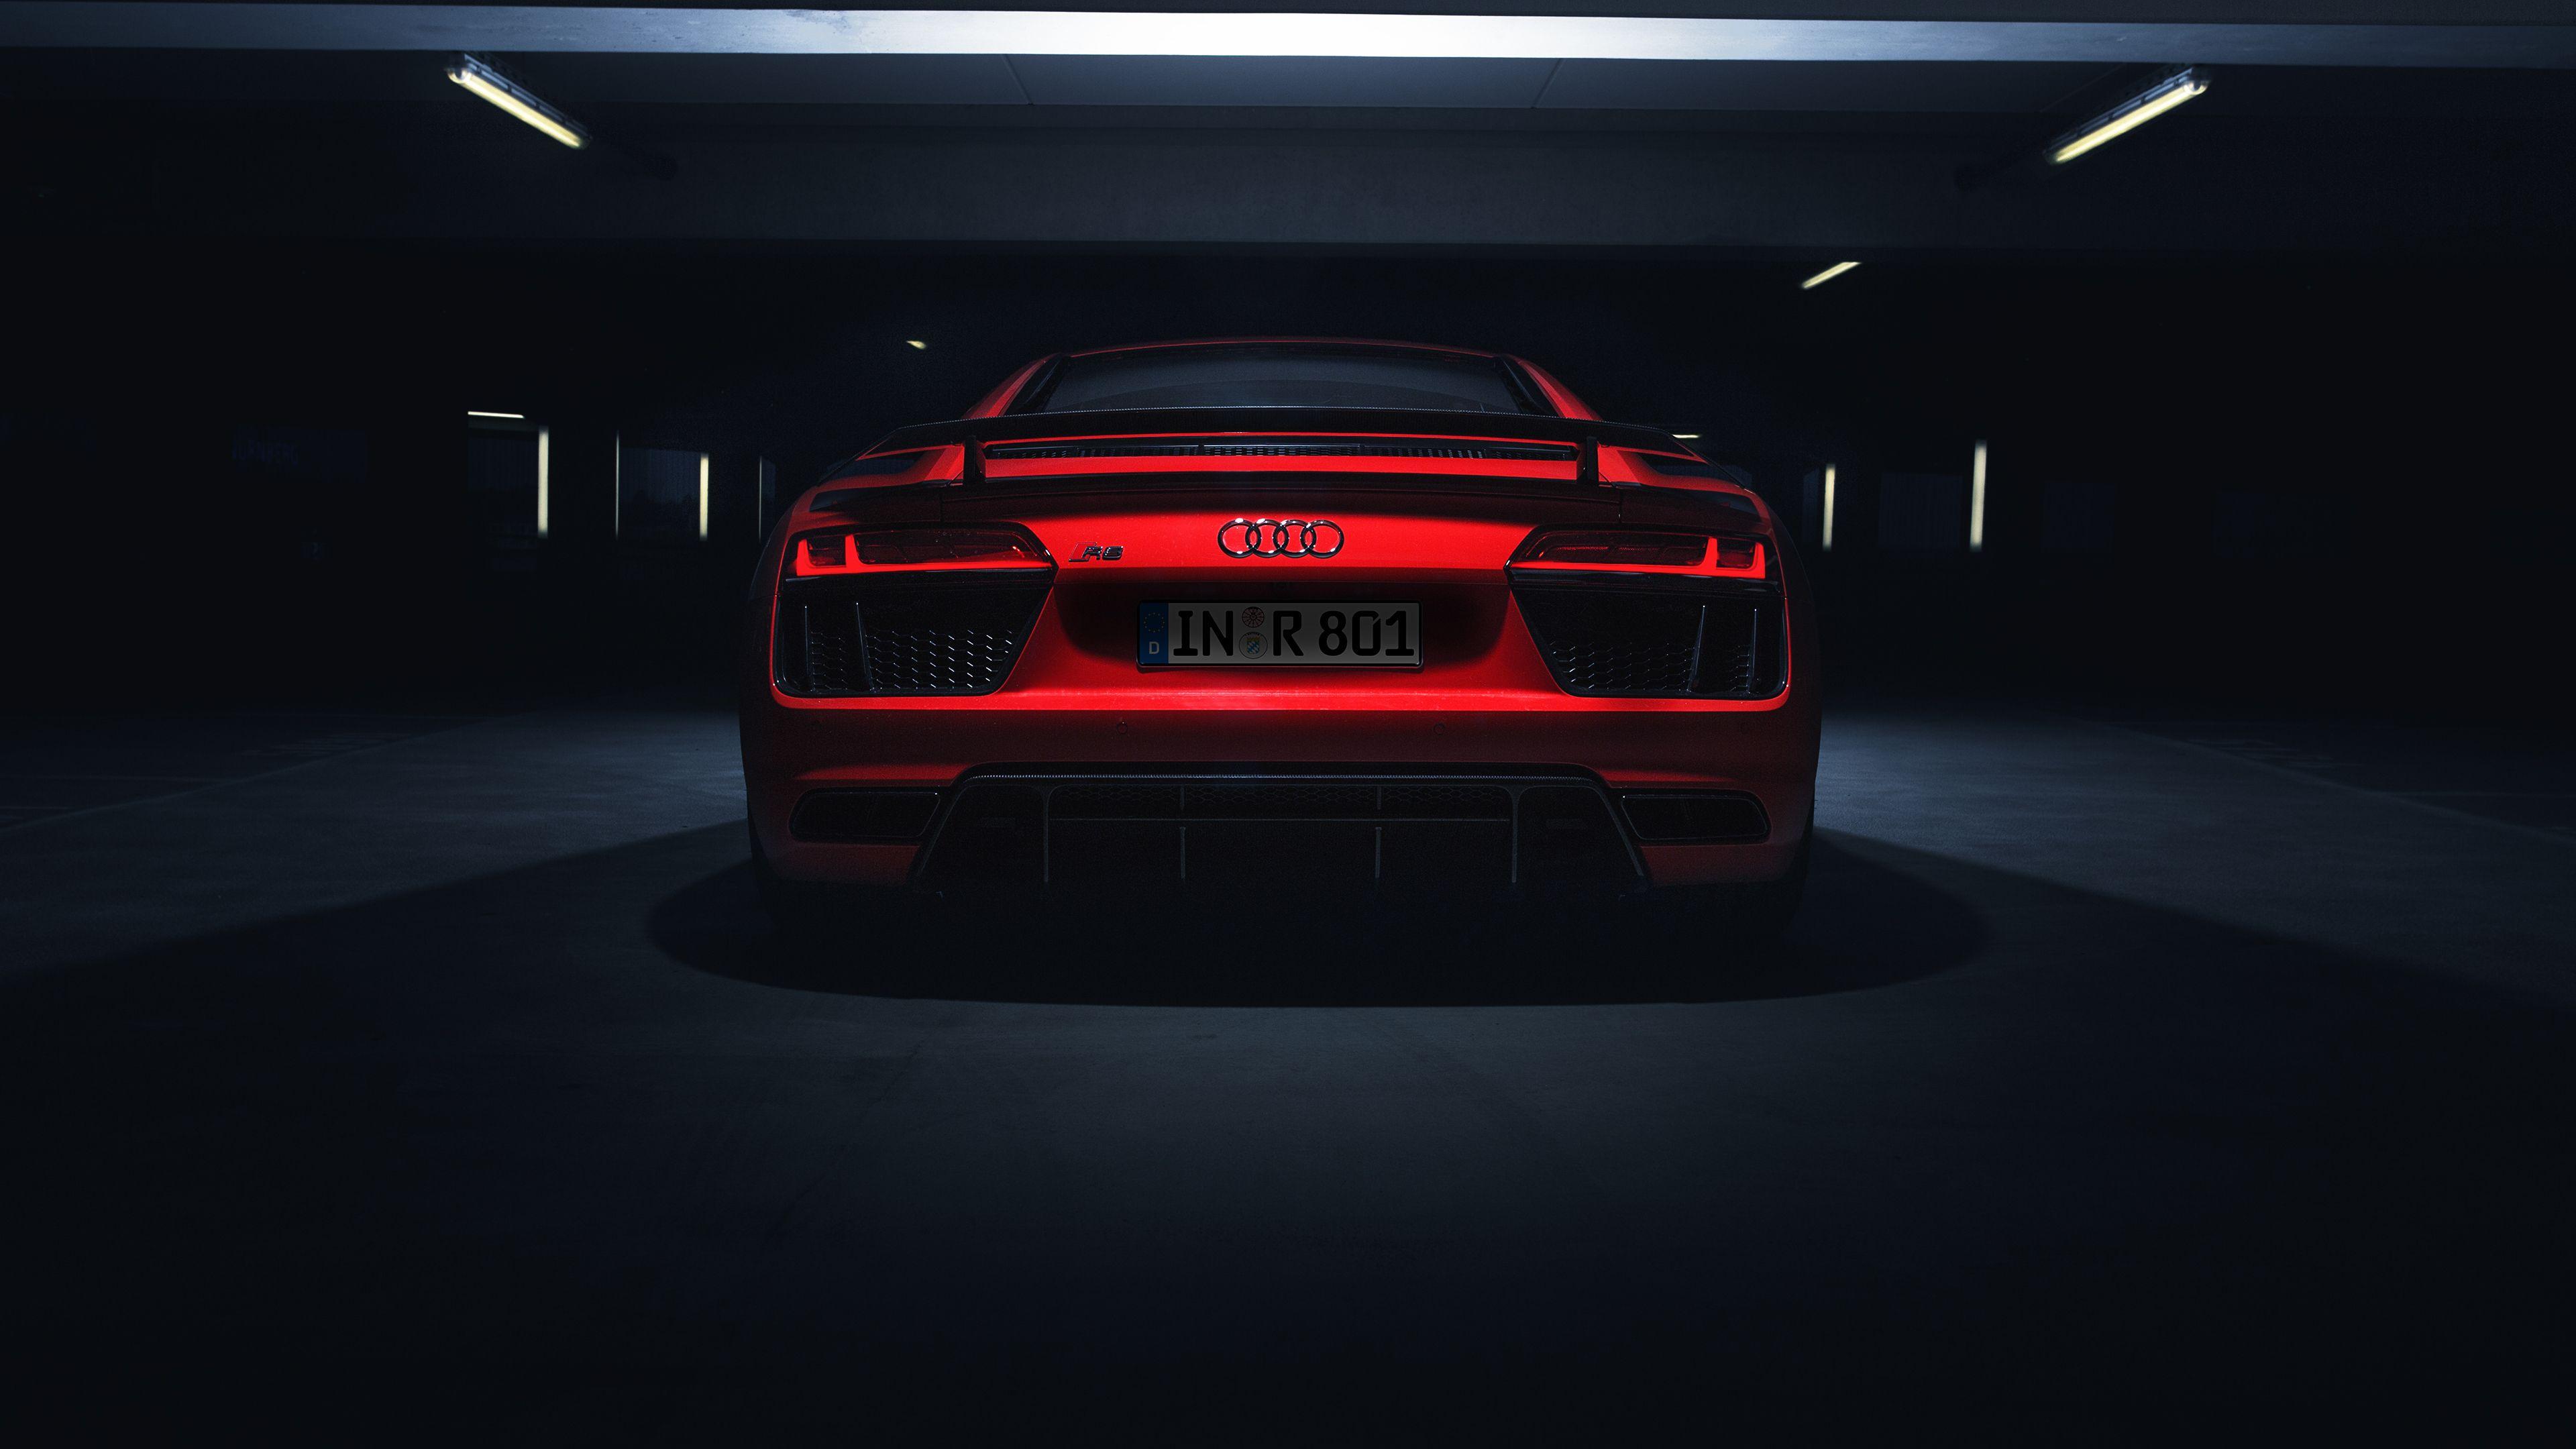 Audi R8 V10 Plus 2018 Rear Look 4k Hd Wallpapers Cars Wallpapers Behance Wallpapers Audi Wallpapers Audi Audi R8 Wallpaper Car Wallpapers Audi R8 V10 Plus